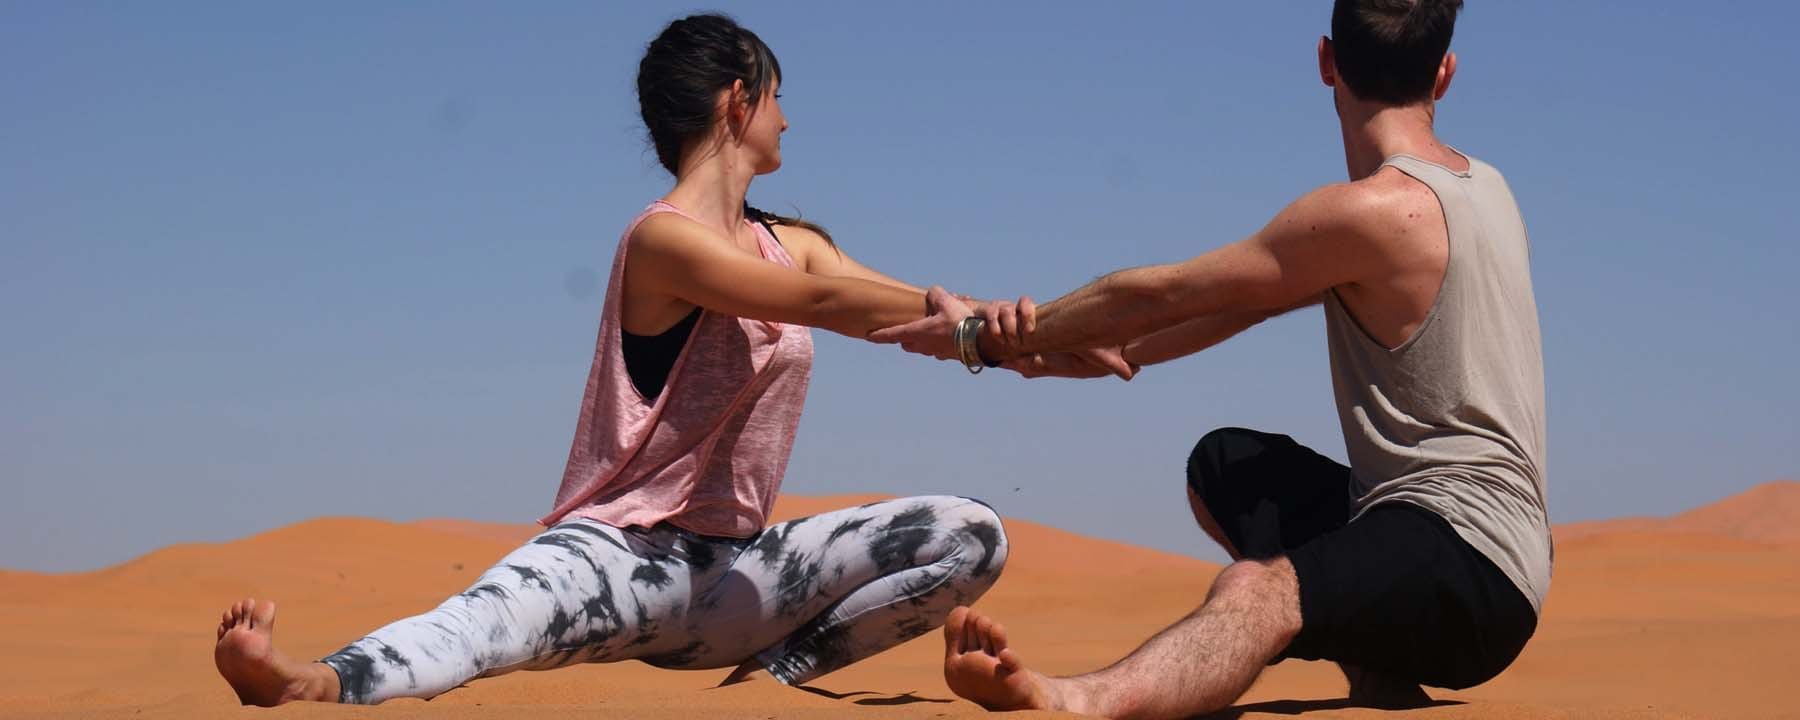 Desert Yoga Ninja Squat_Source NOSADE